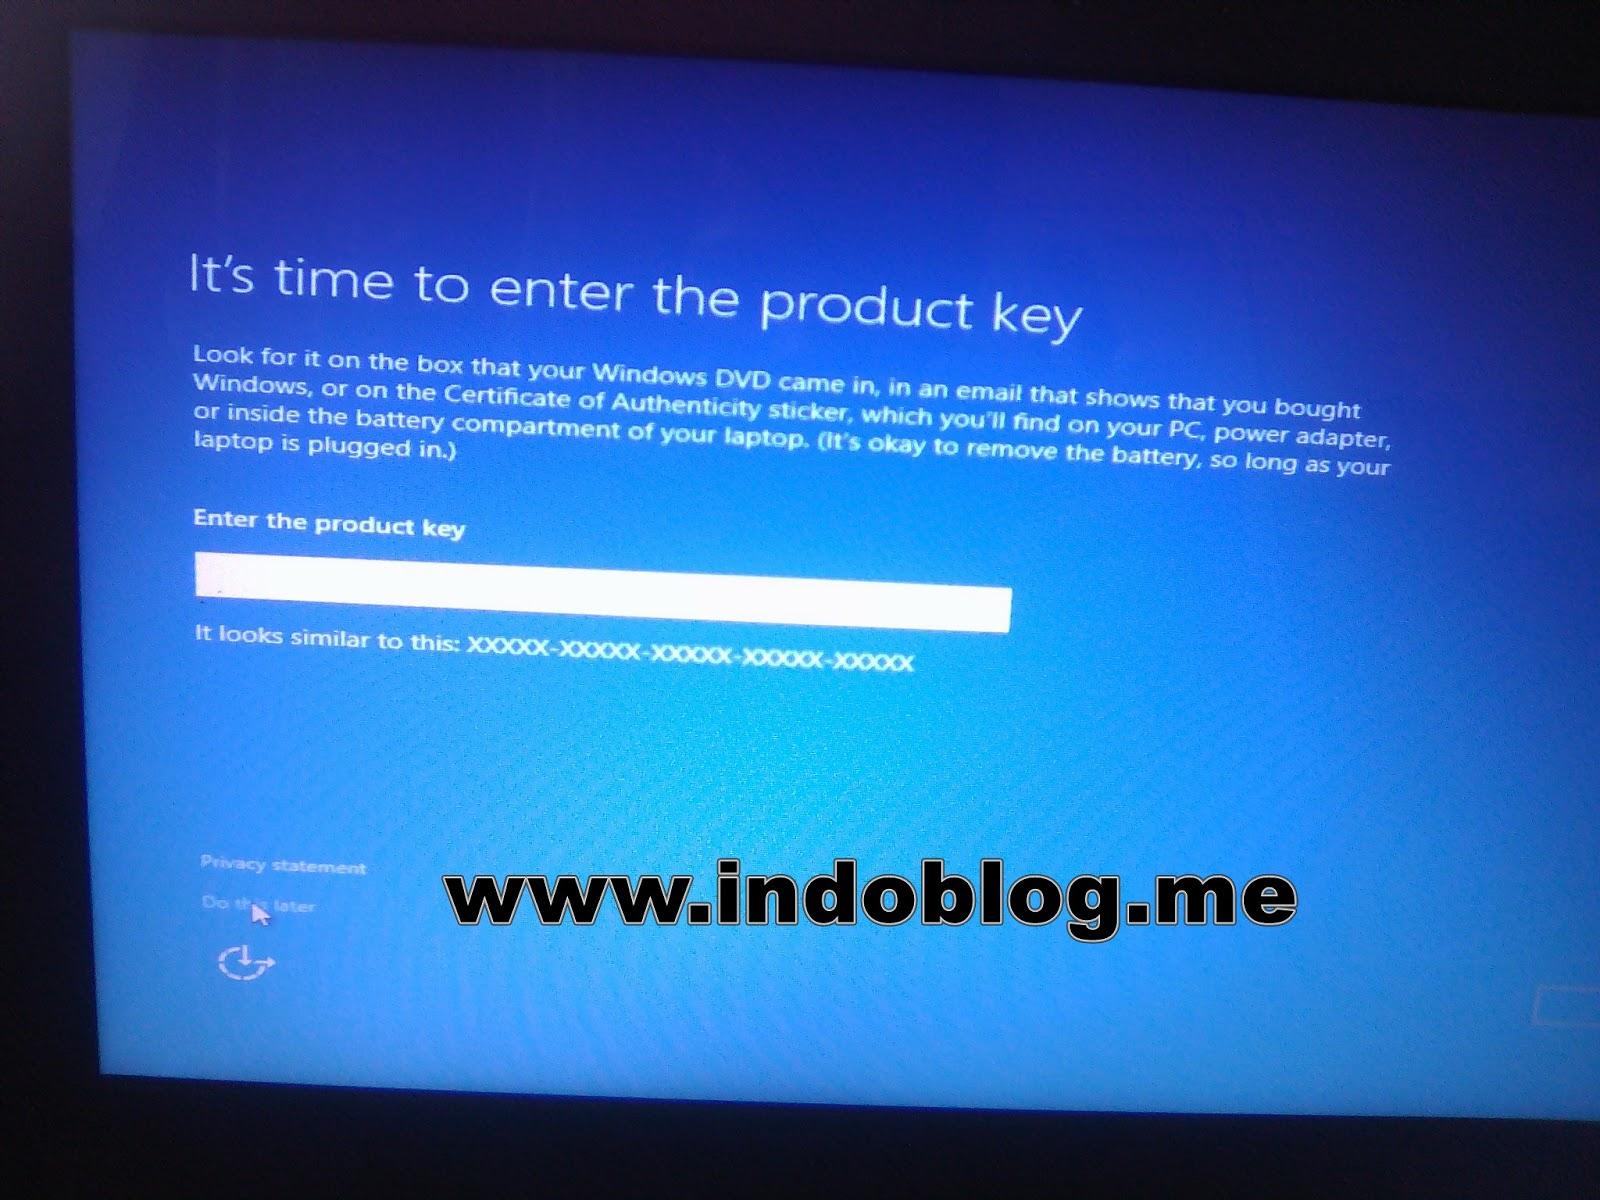 Cara Instal Windows 10 Di Laptop Baru Lengkap Dengan Gambar Paket Dvd Ulang Komputer Bootable Flashdisk Poweriso